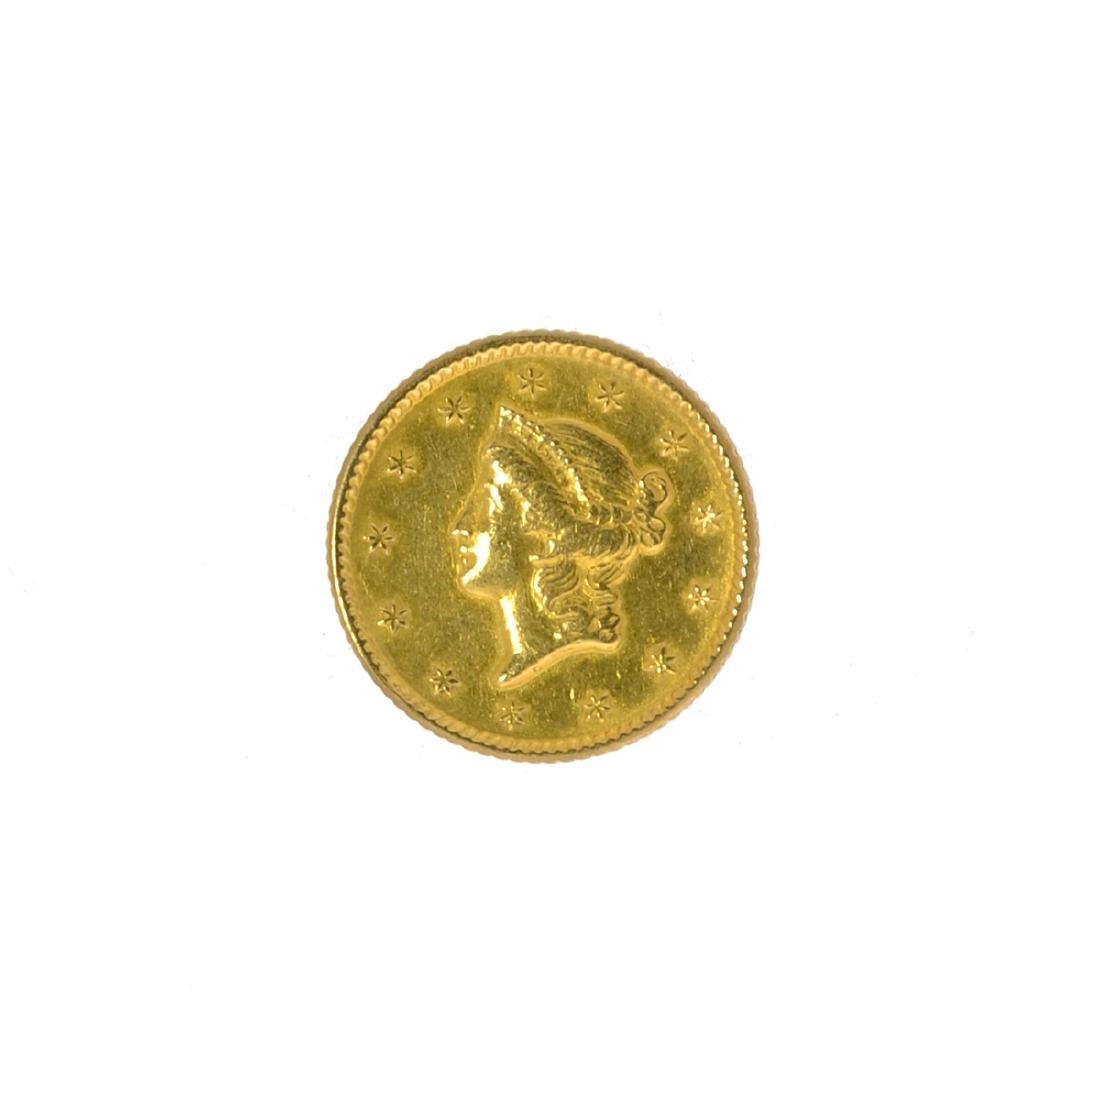 *1851 $1 U.S. Liberty Head Gold Coin (JG N)